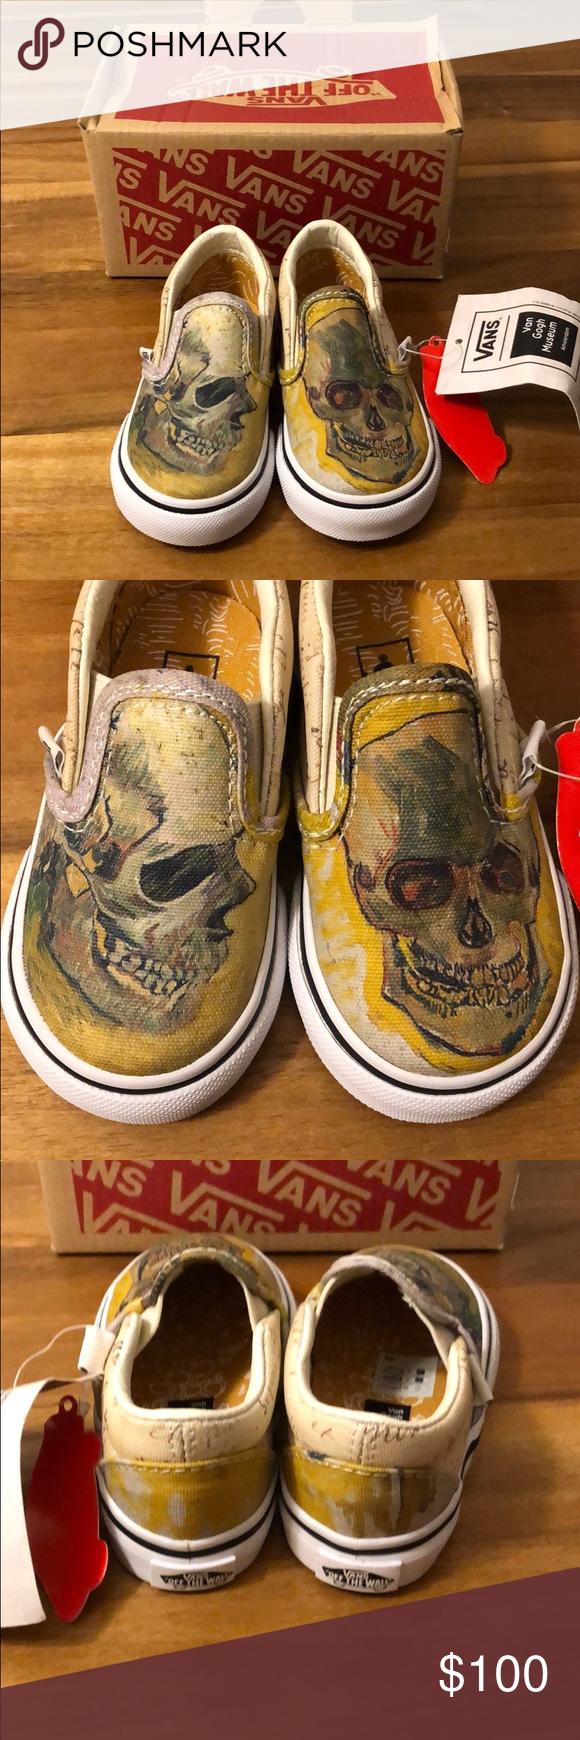 Vans Vincent Van Gogh Skull Slip On Vans Gogh Slip On